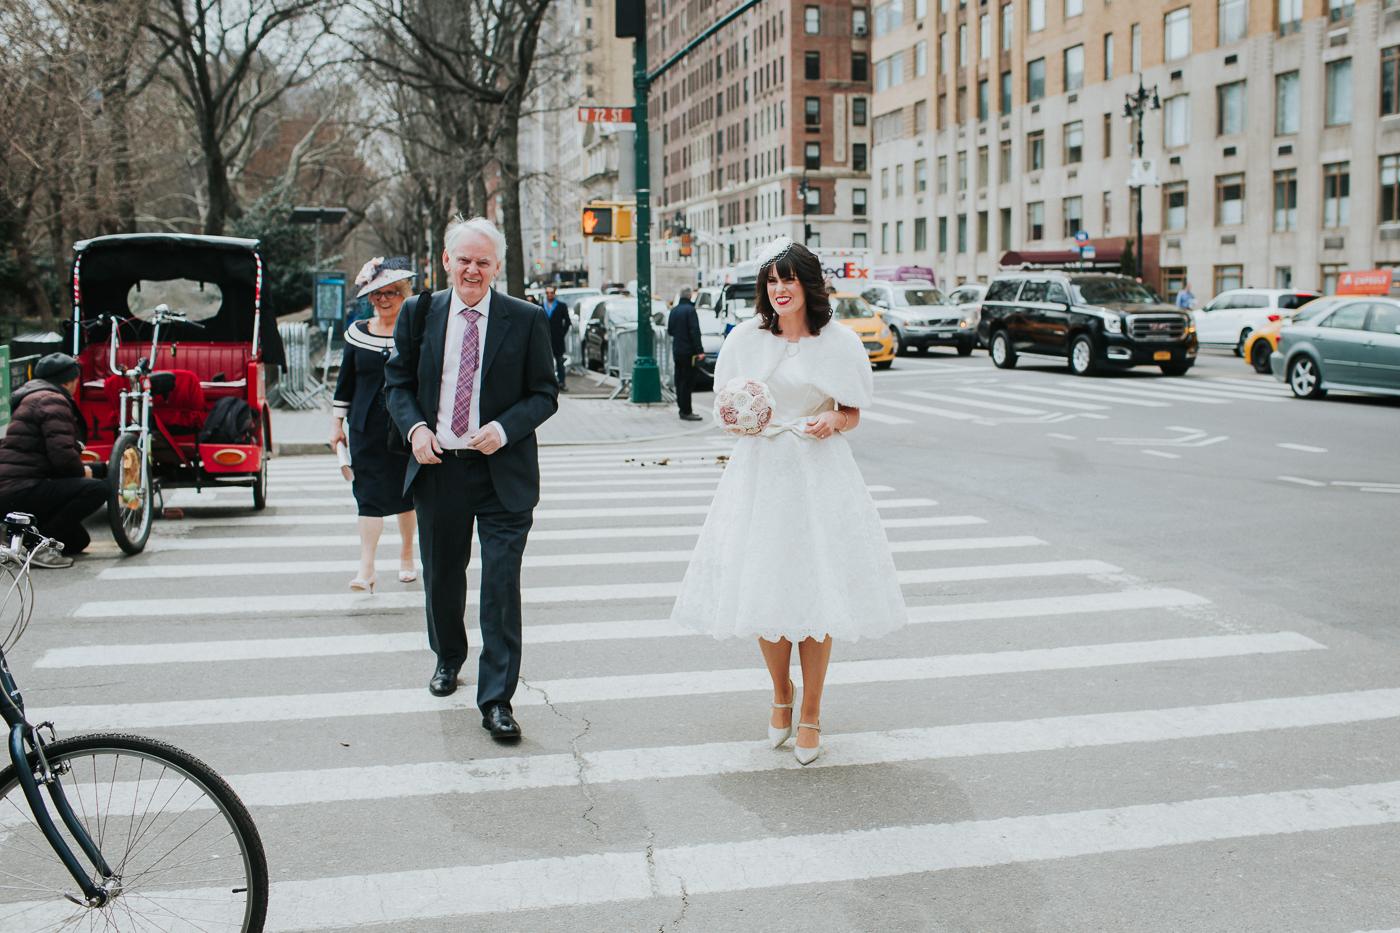 Ladies-Pavilion-Central-Park-NYC-Documentary-Elopement-Wedding-Photographer-9.jpg